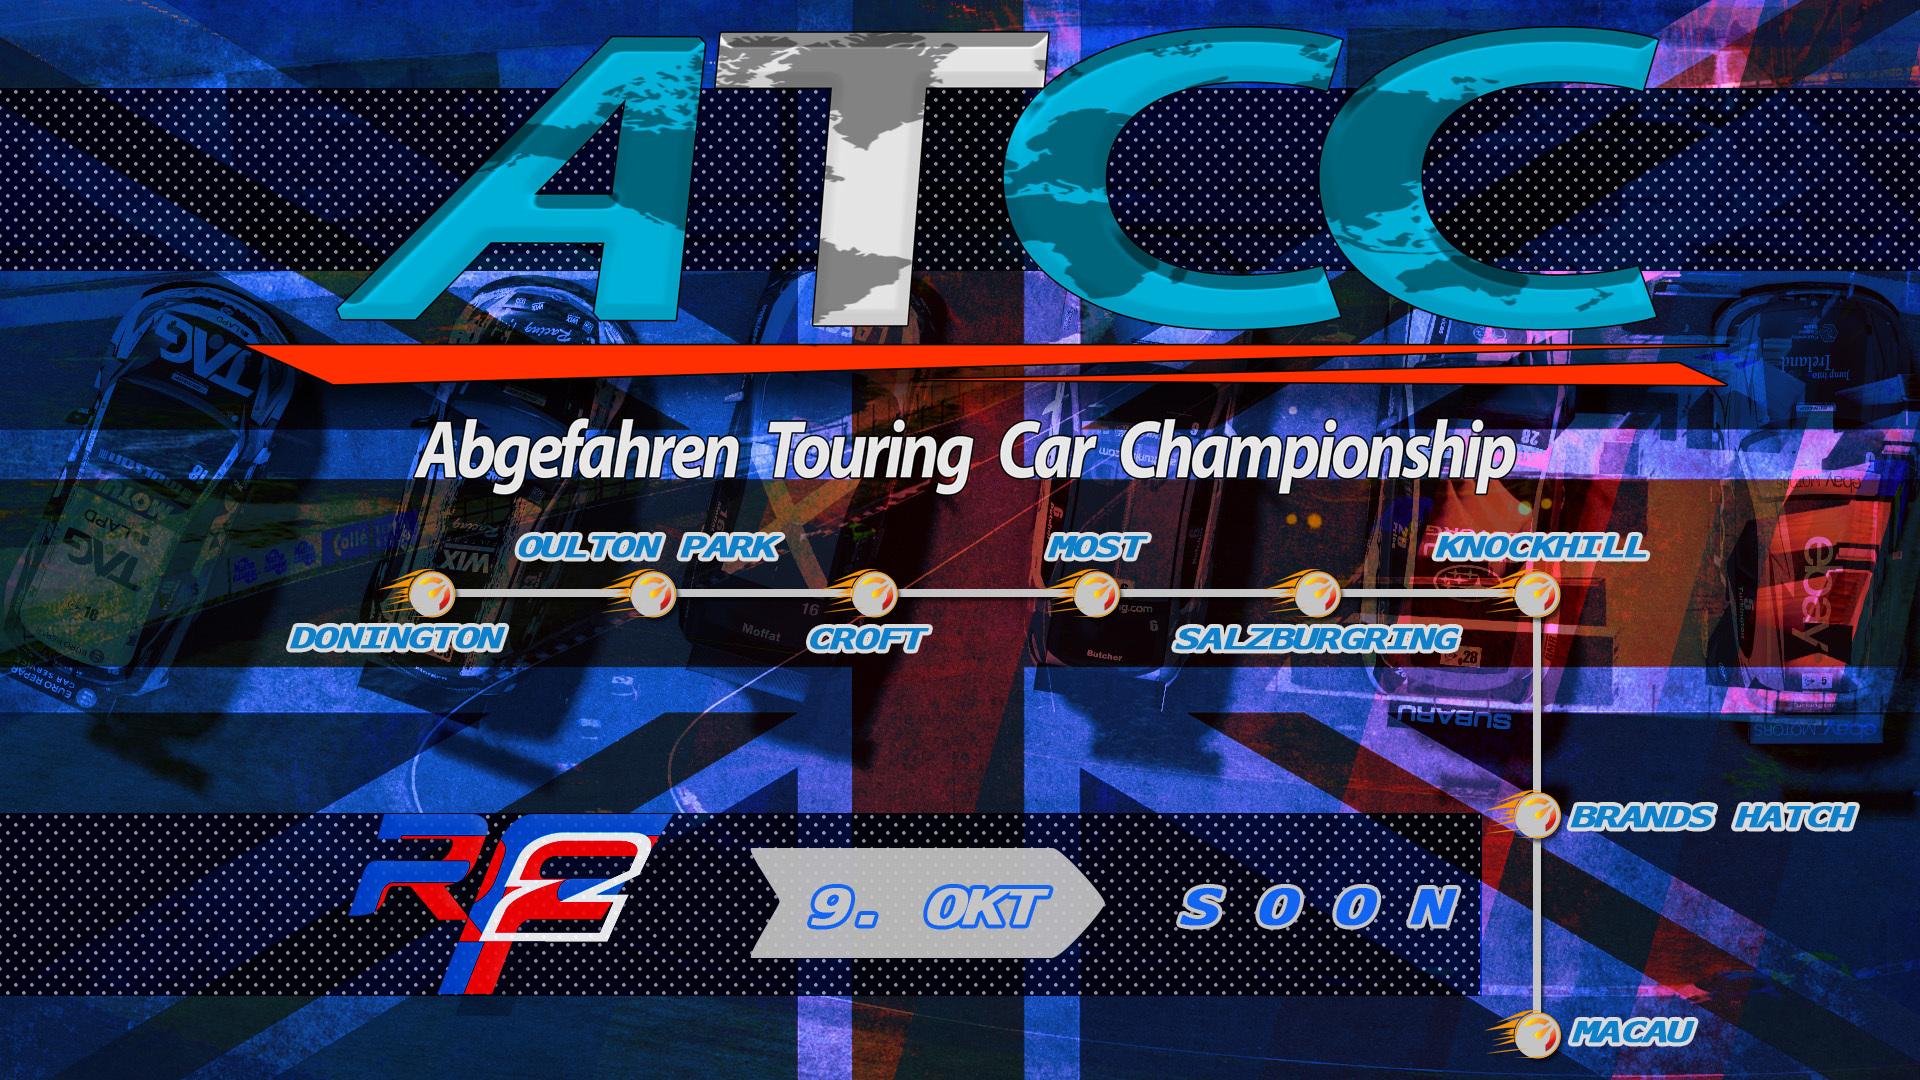 rF2 - Abgefahren Touring Car Championship